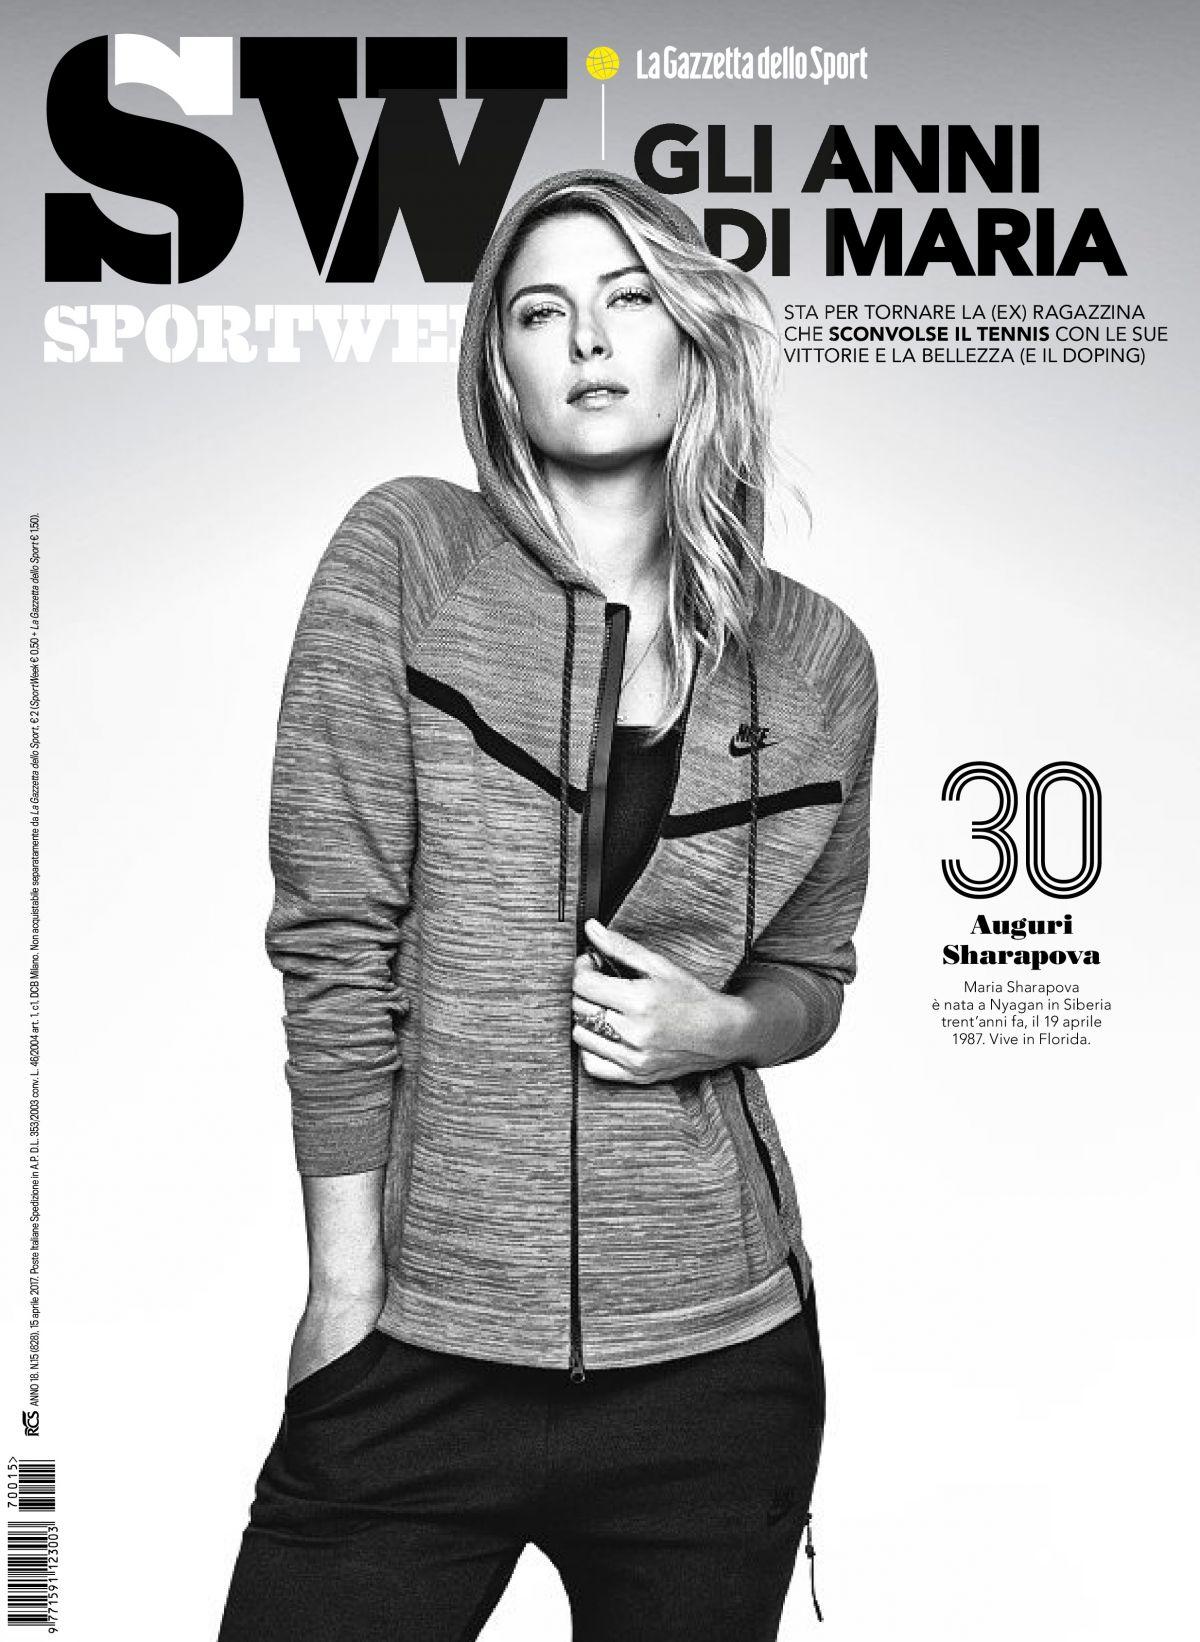 MARIA SHARAPOVA in Sportweek Magazine, Italy April 2017 Issue